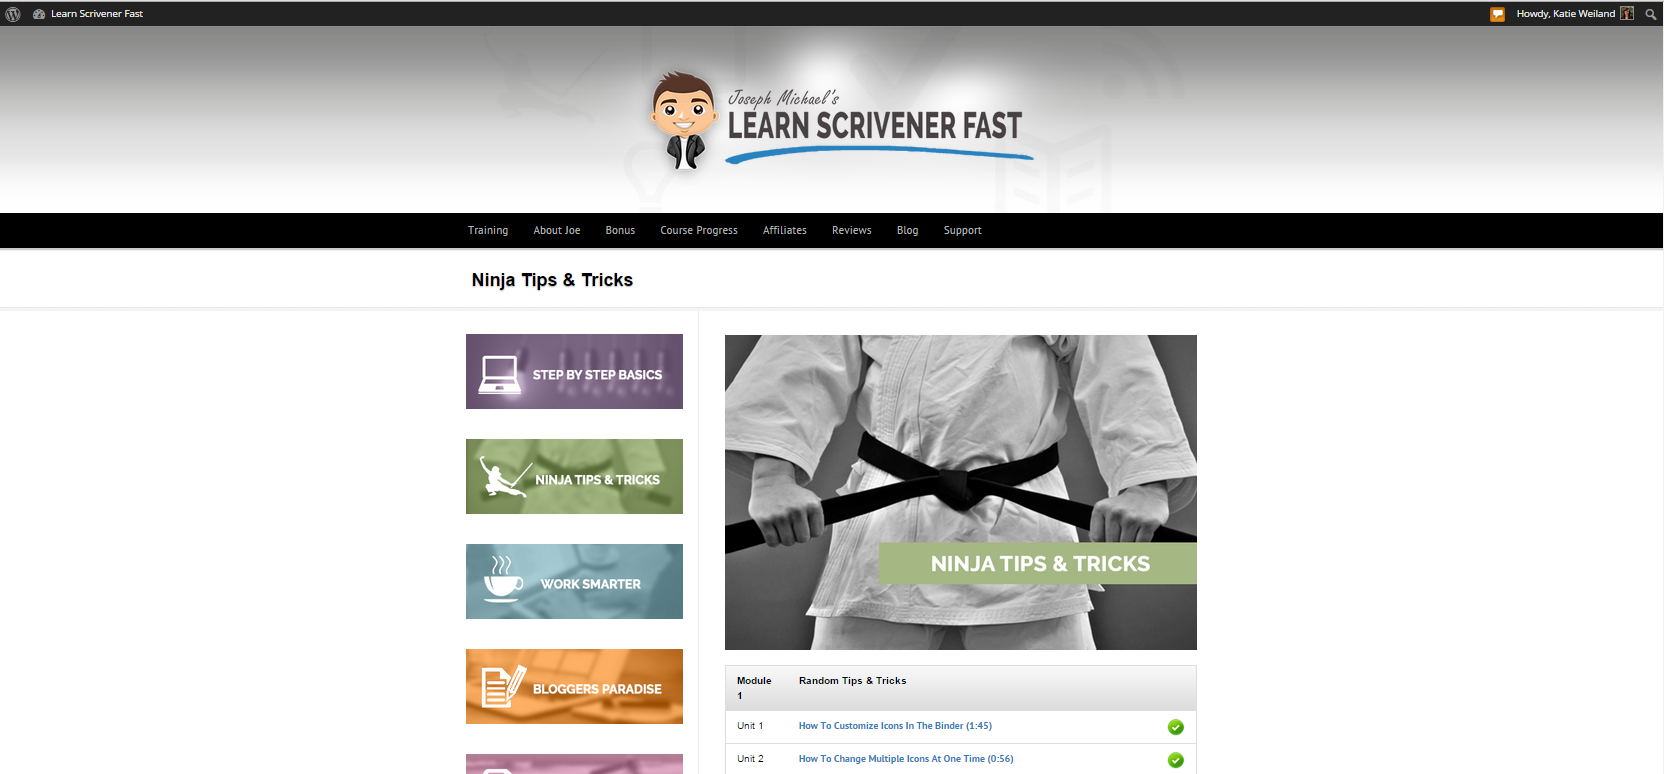 Learn_Scrivener_Fast_Joseph_Michael_Ninja_Tips_and_Tricks